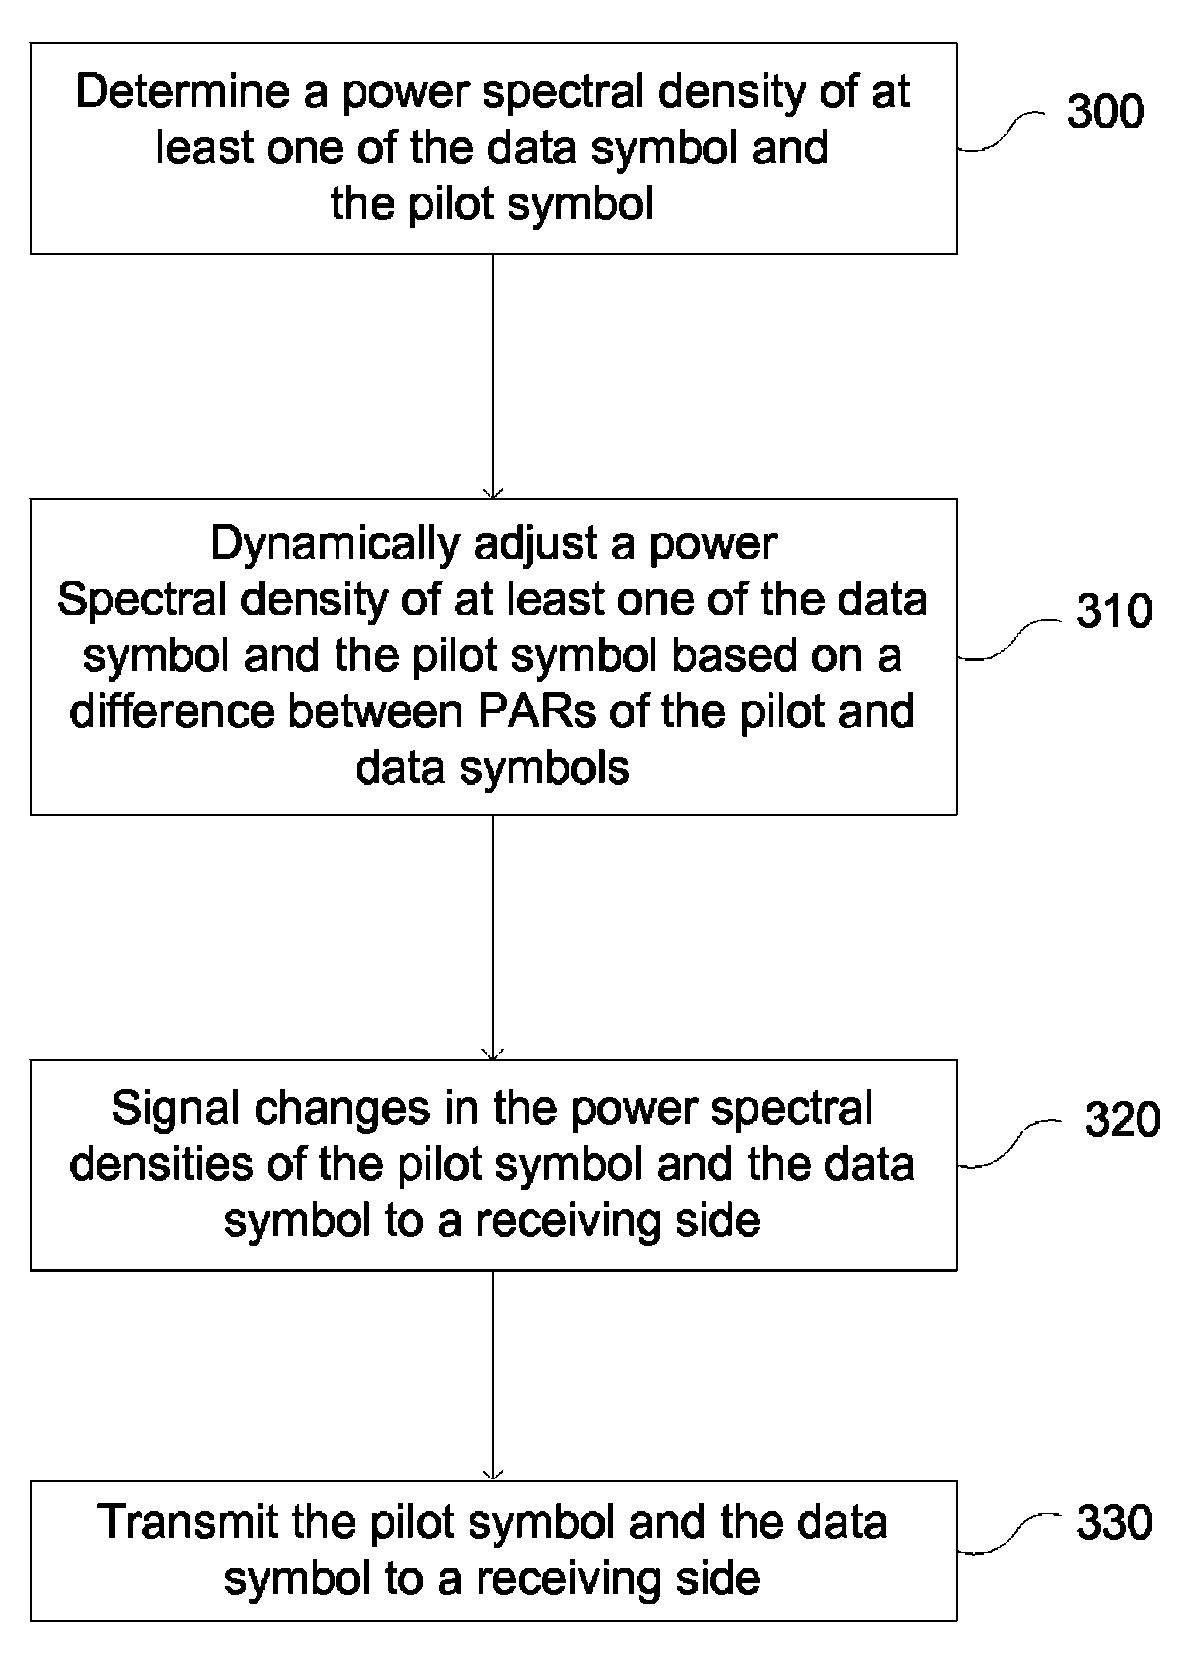 65 Symbol For Power Spectral Density Density Power Symbol For Spectral